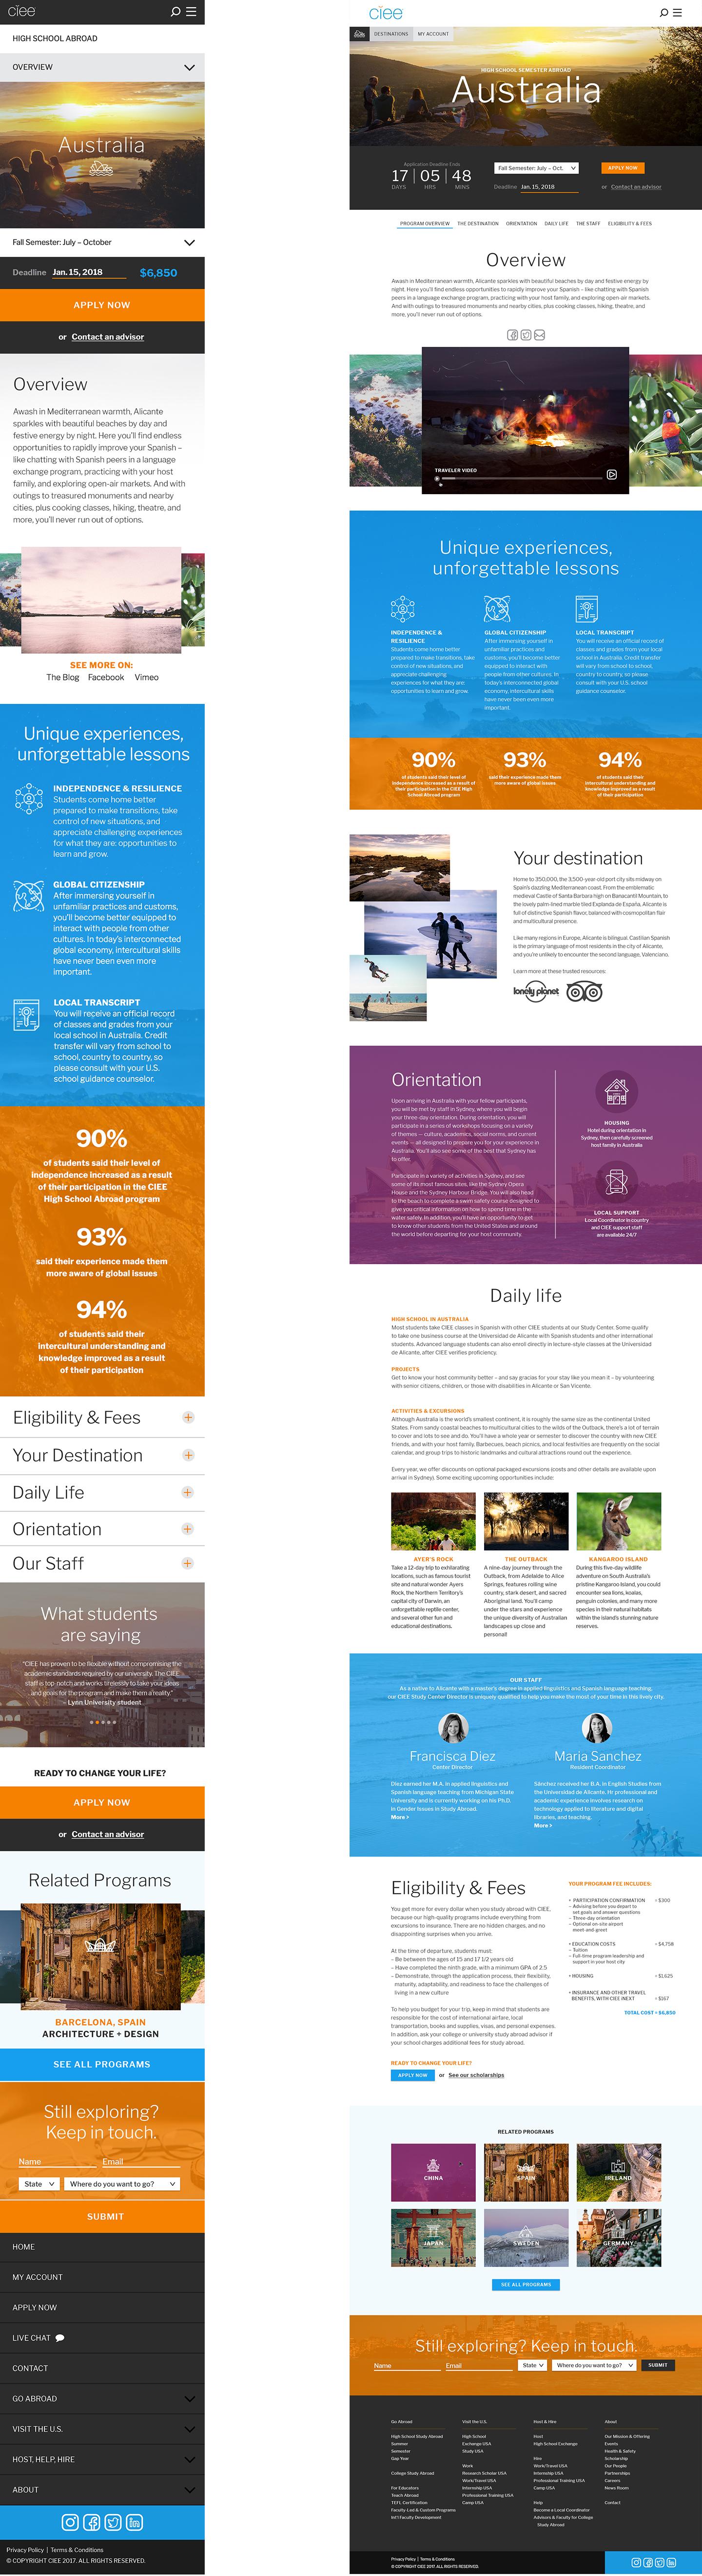 ciee_website_secondary_desktop_andmobile.jpg